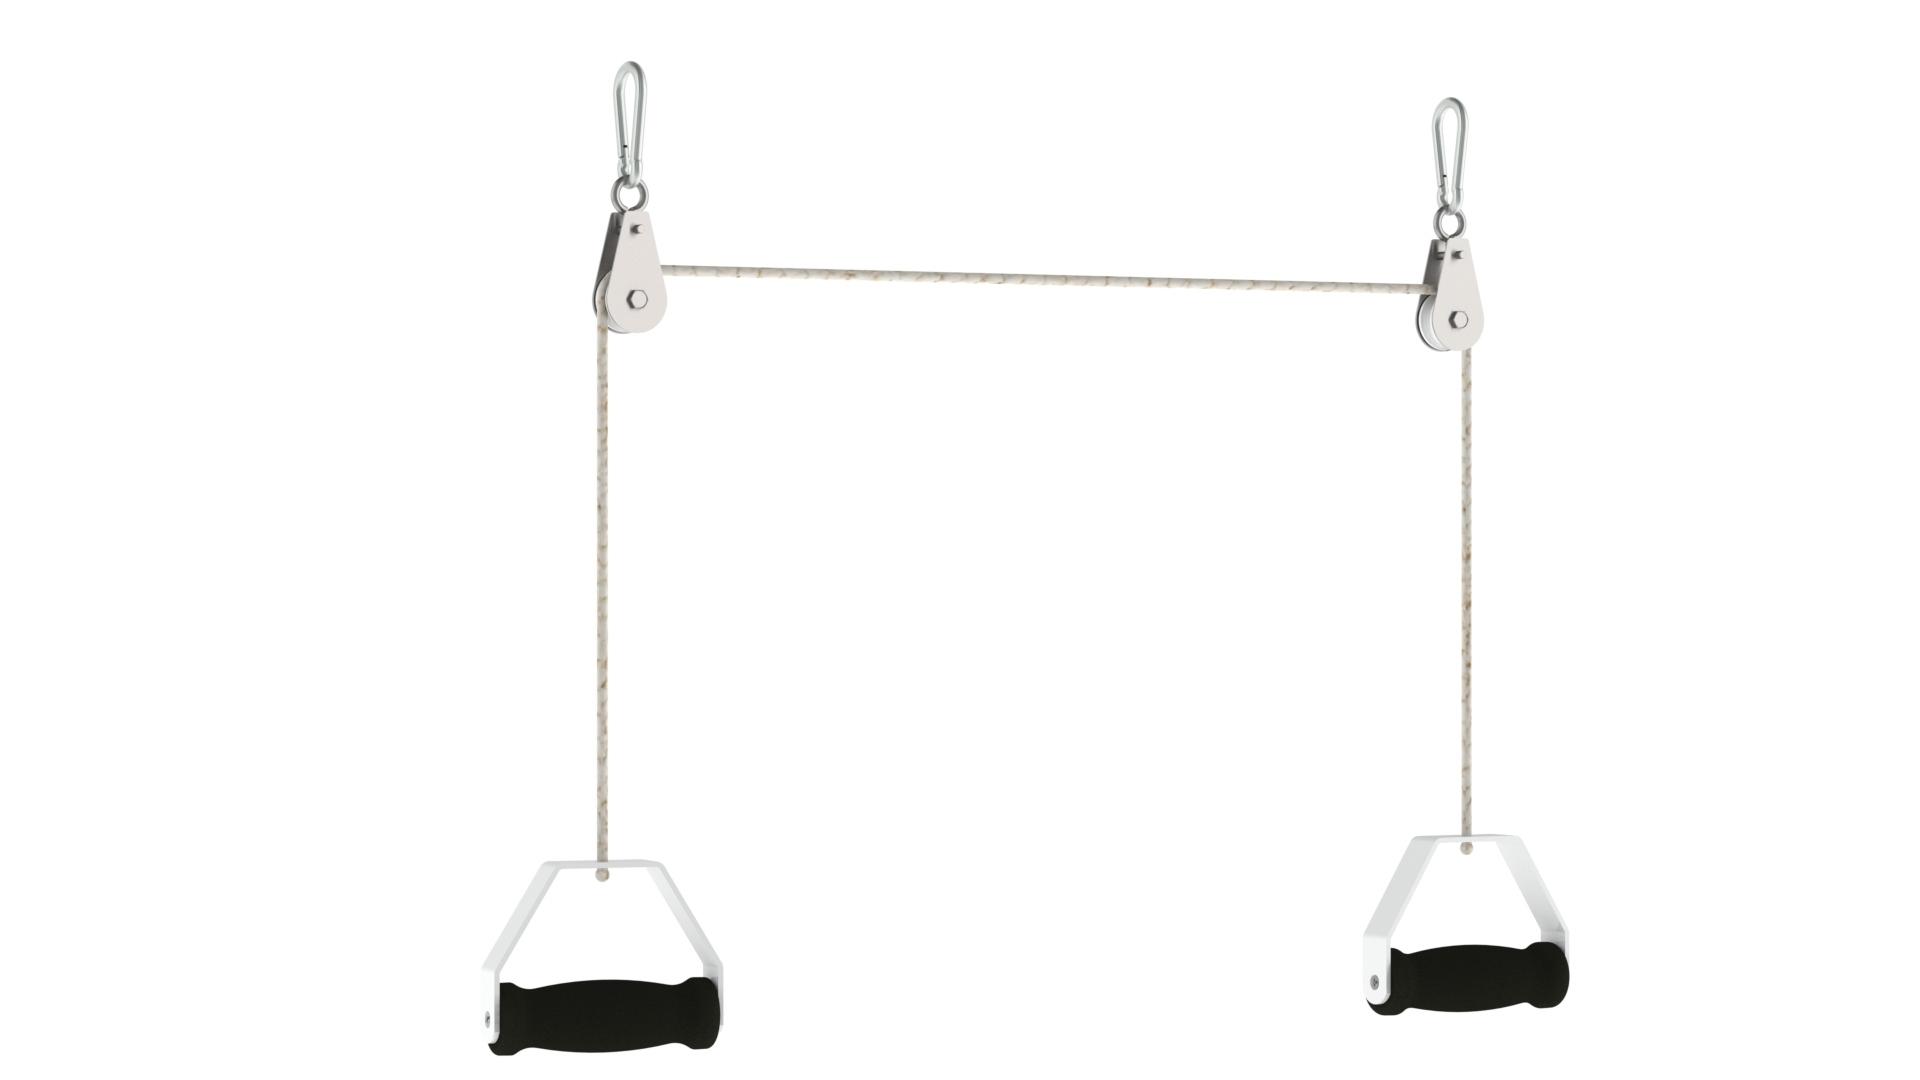 PAFIDV003_Sistema de roldanas com 2 ganchos